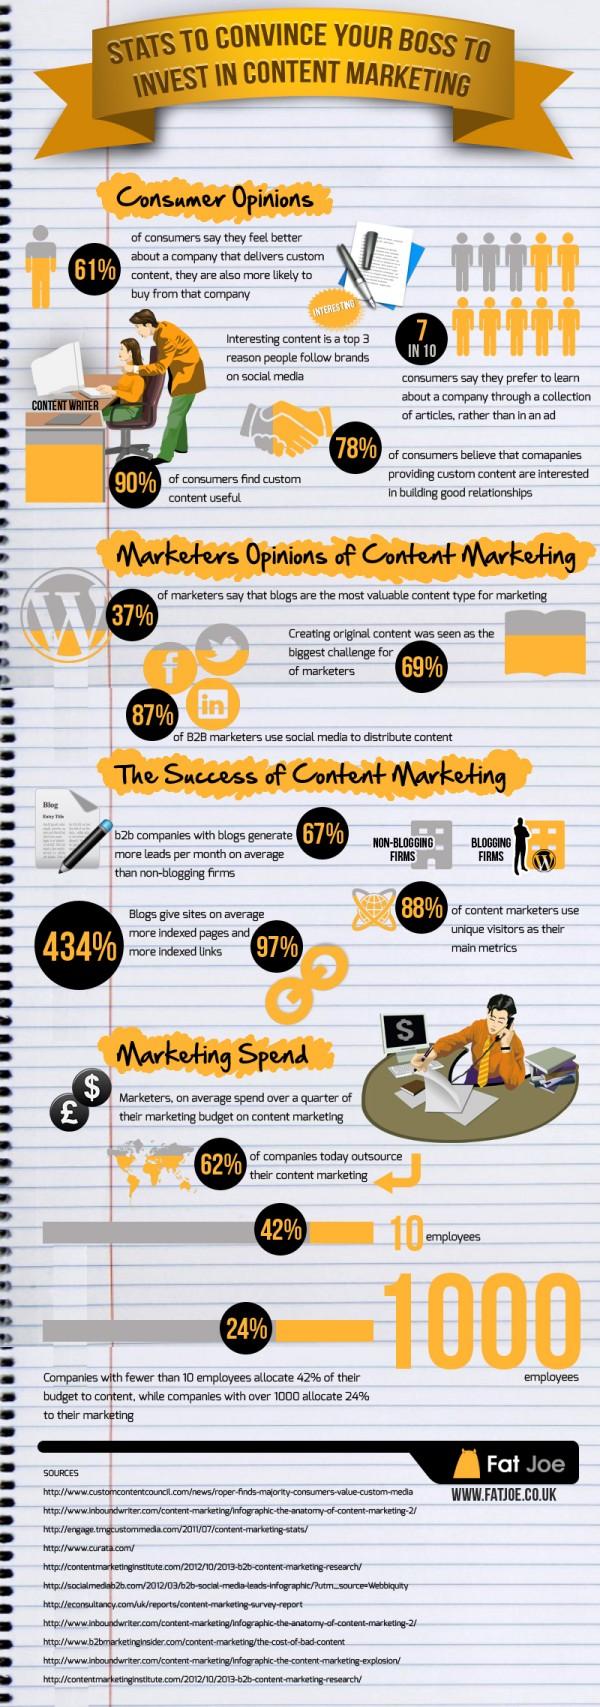 How content drives a business (credit: www.fatjoe.co.uk)